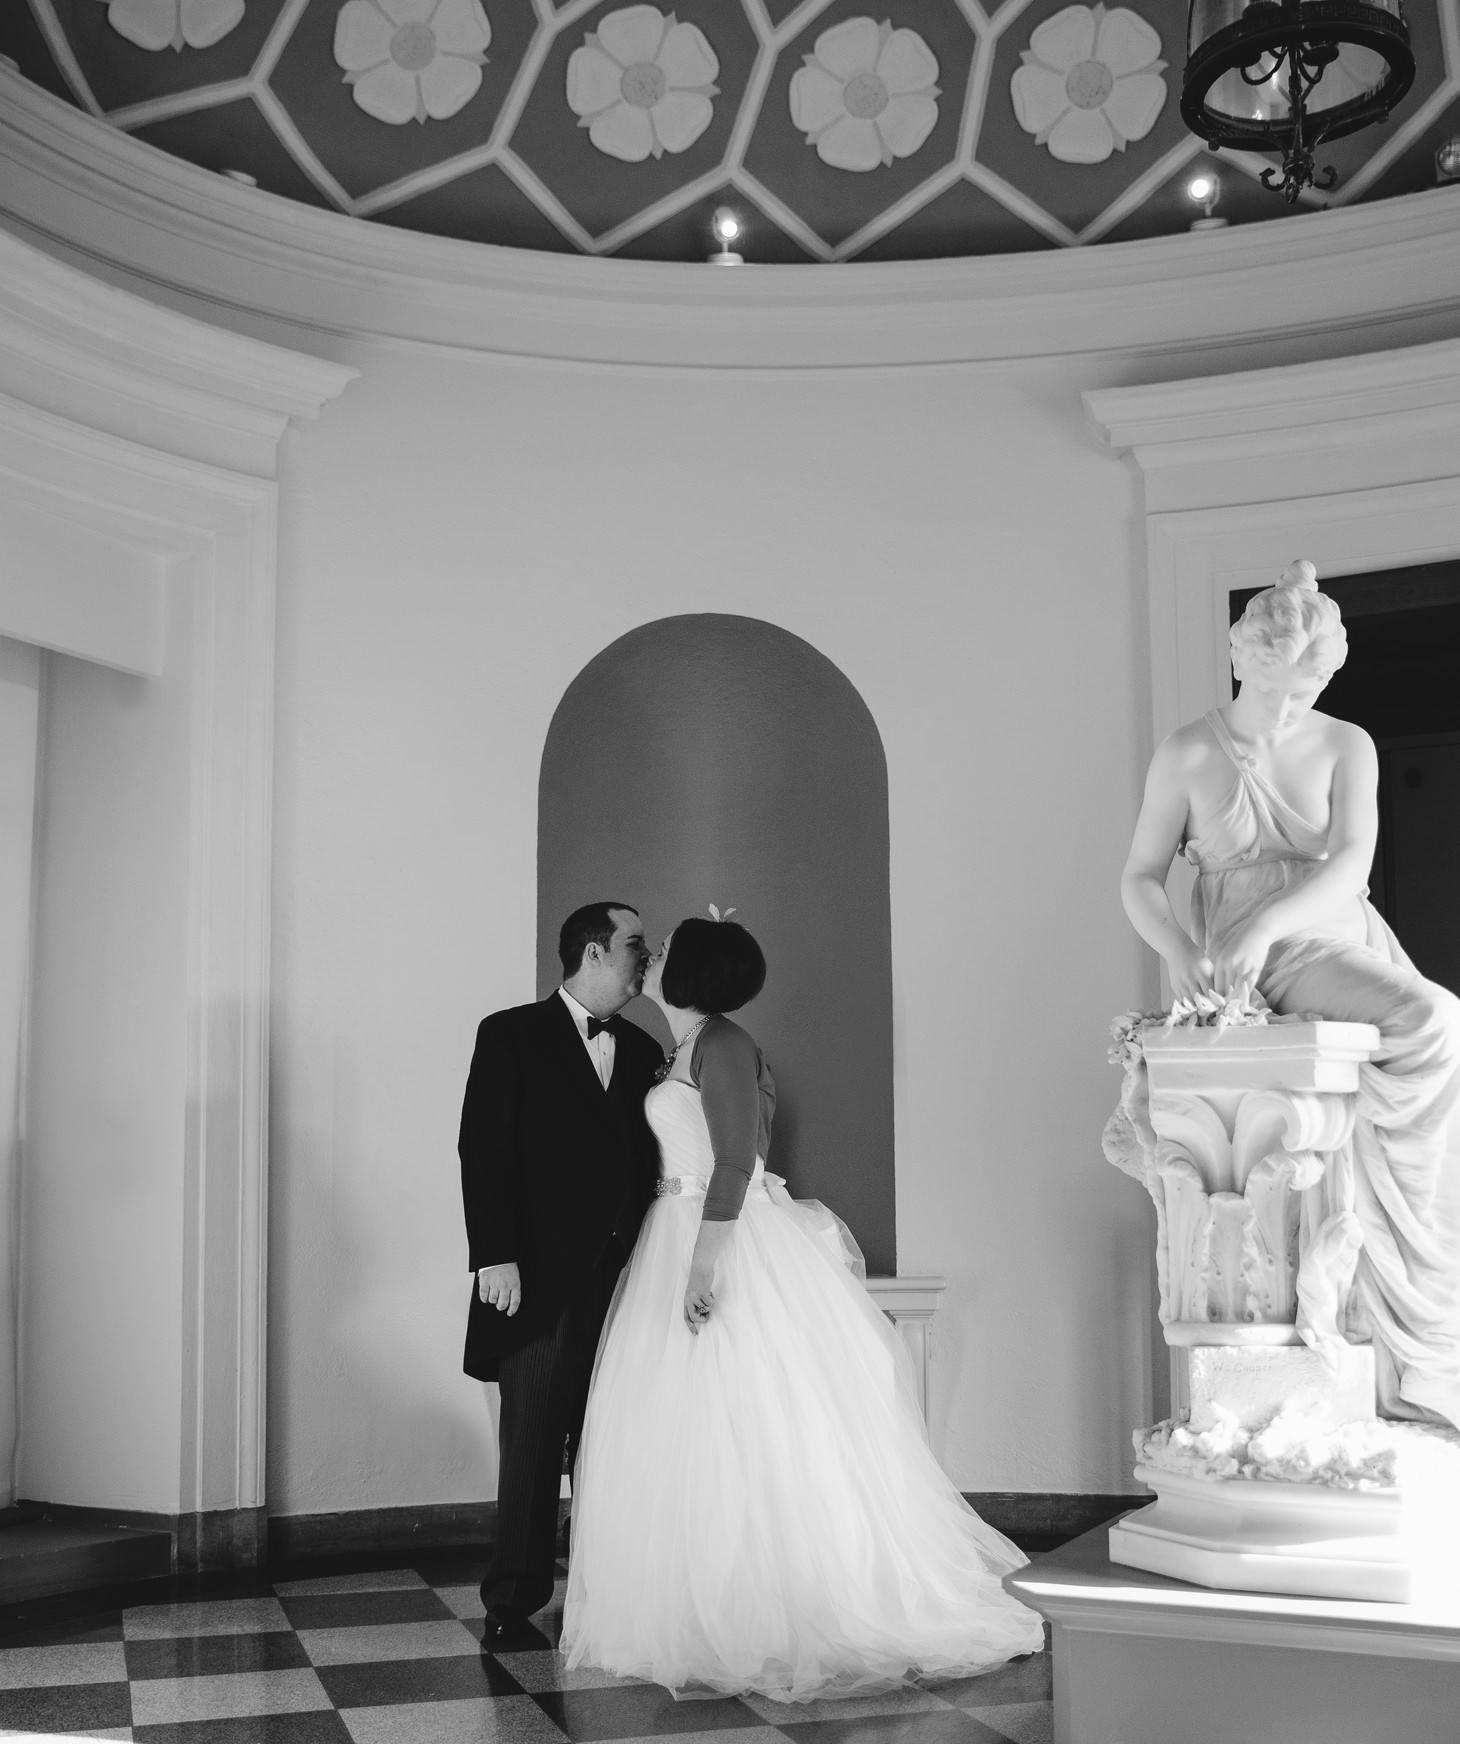 050-nyc-wedding-photographer-smitten-chickens-nj-montclair-art-museum.jpg